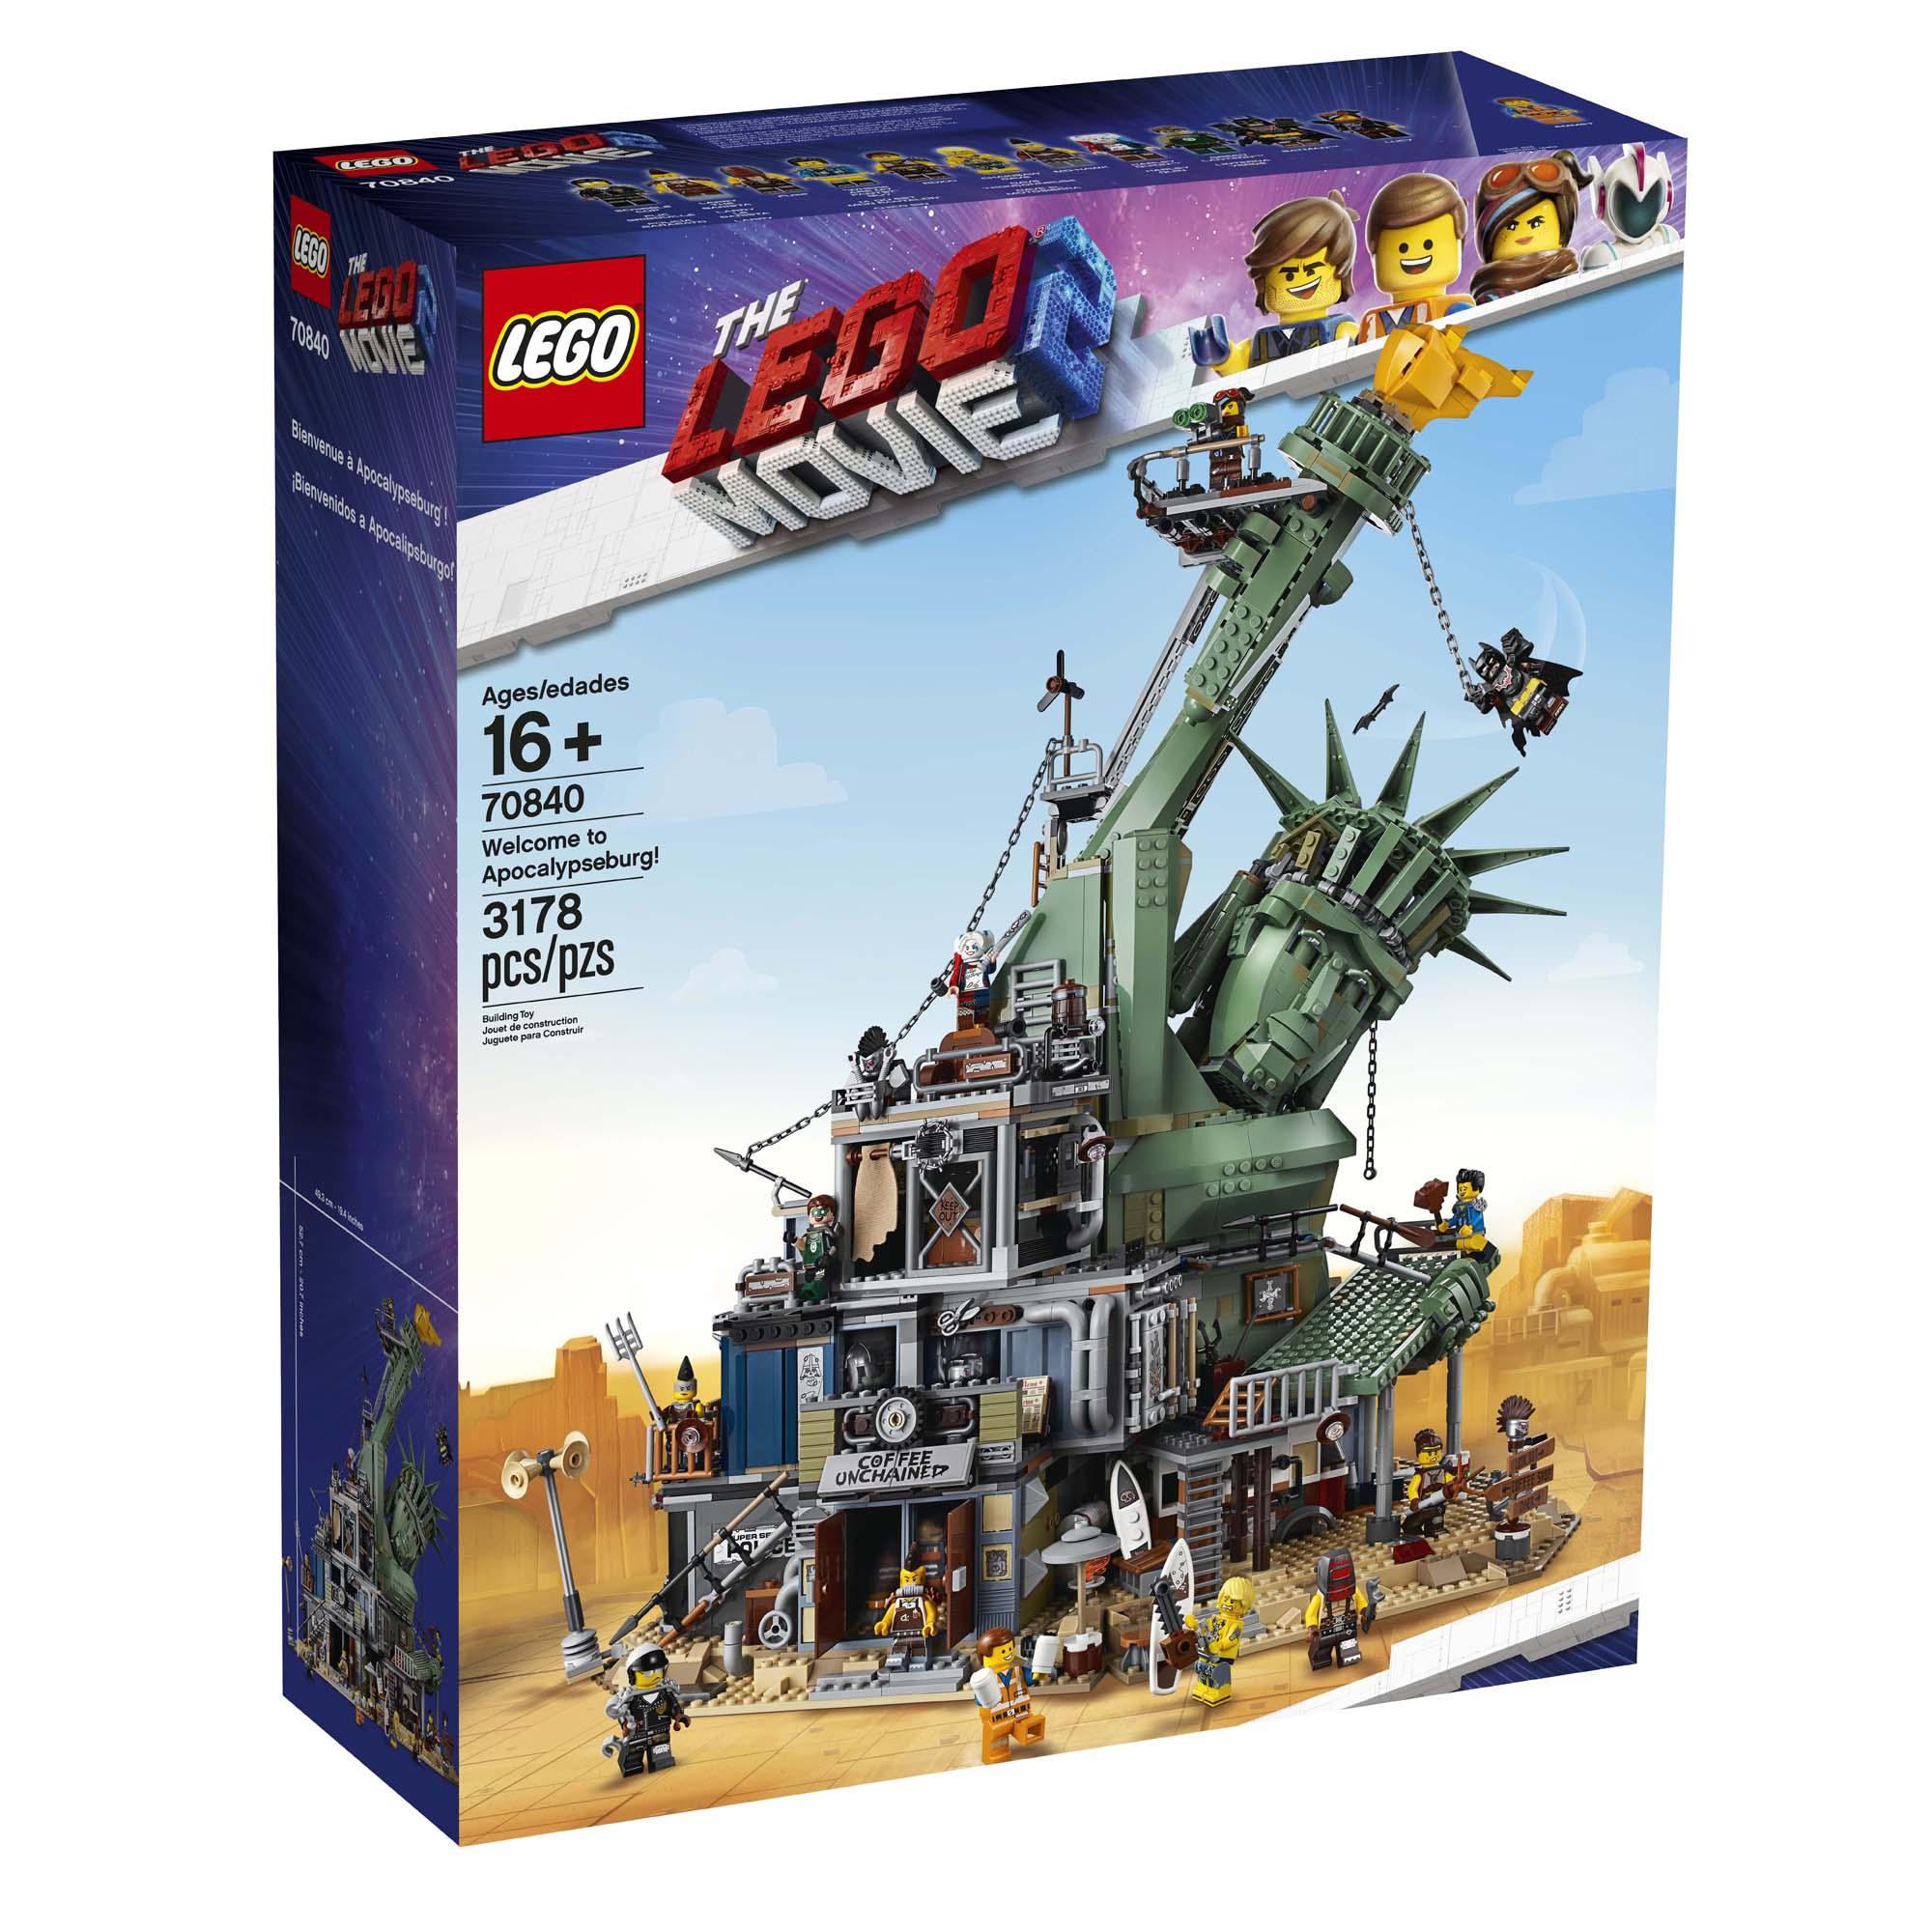 The Lego Movie 2 Sets Retiring Soon The Brick Fan